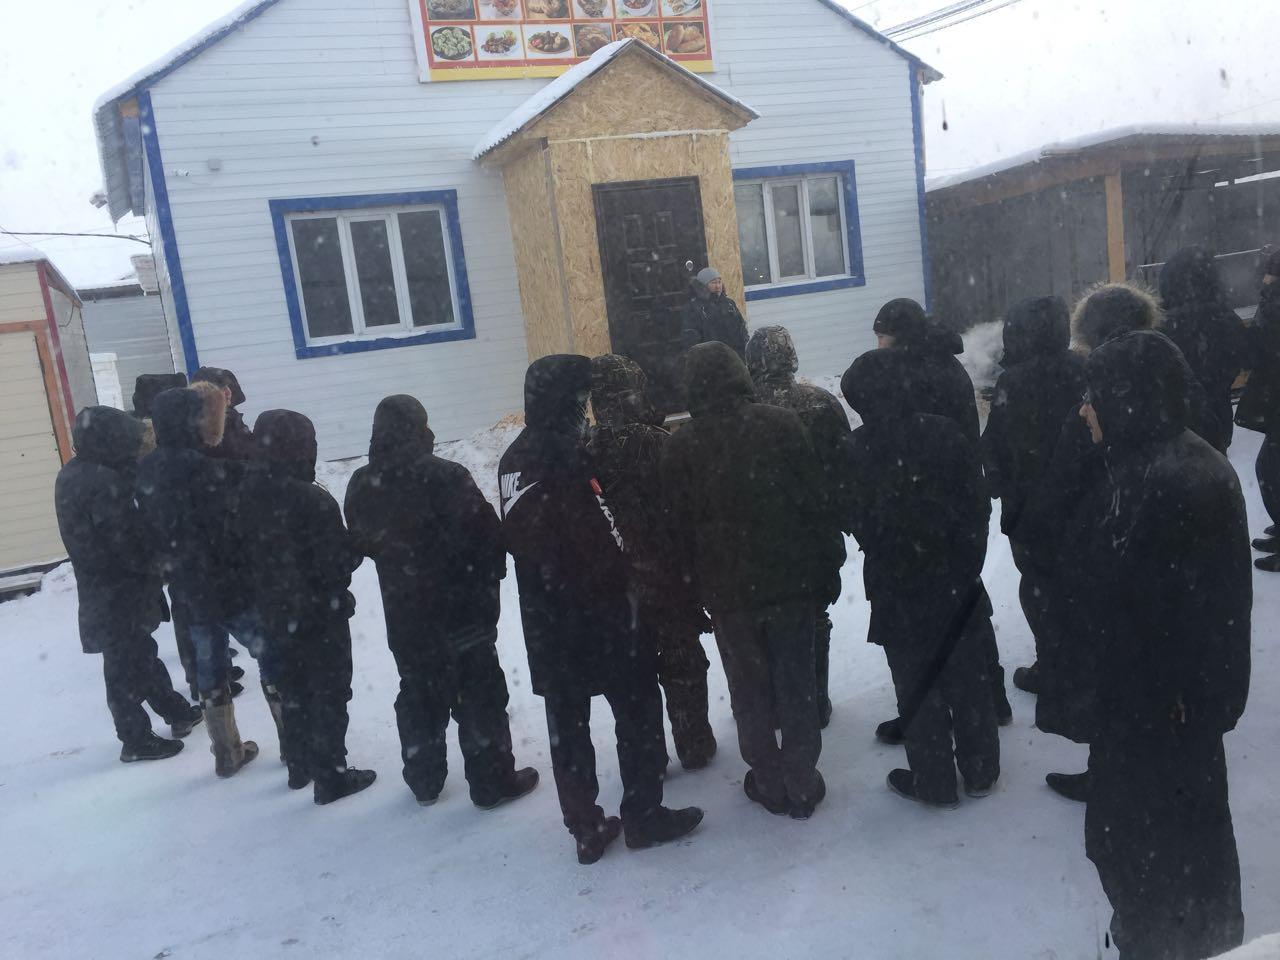 63f0d139-82af-4e69-aefd-e8d148e0342b В Намцах местный житель и работники из Узбекистана не поделили снег